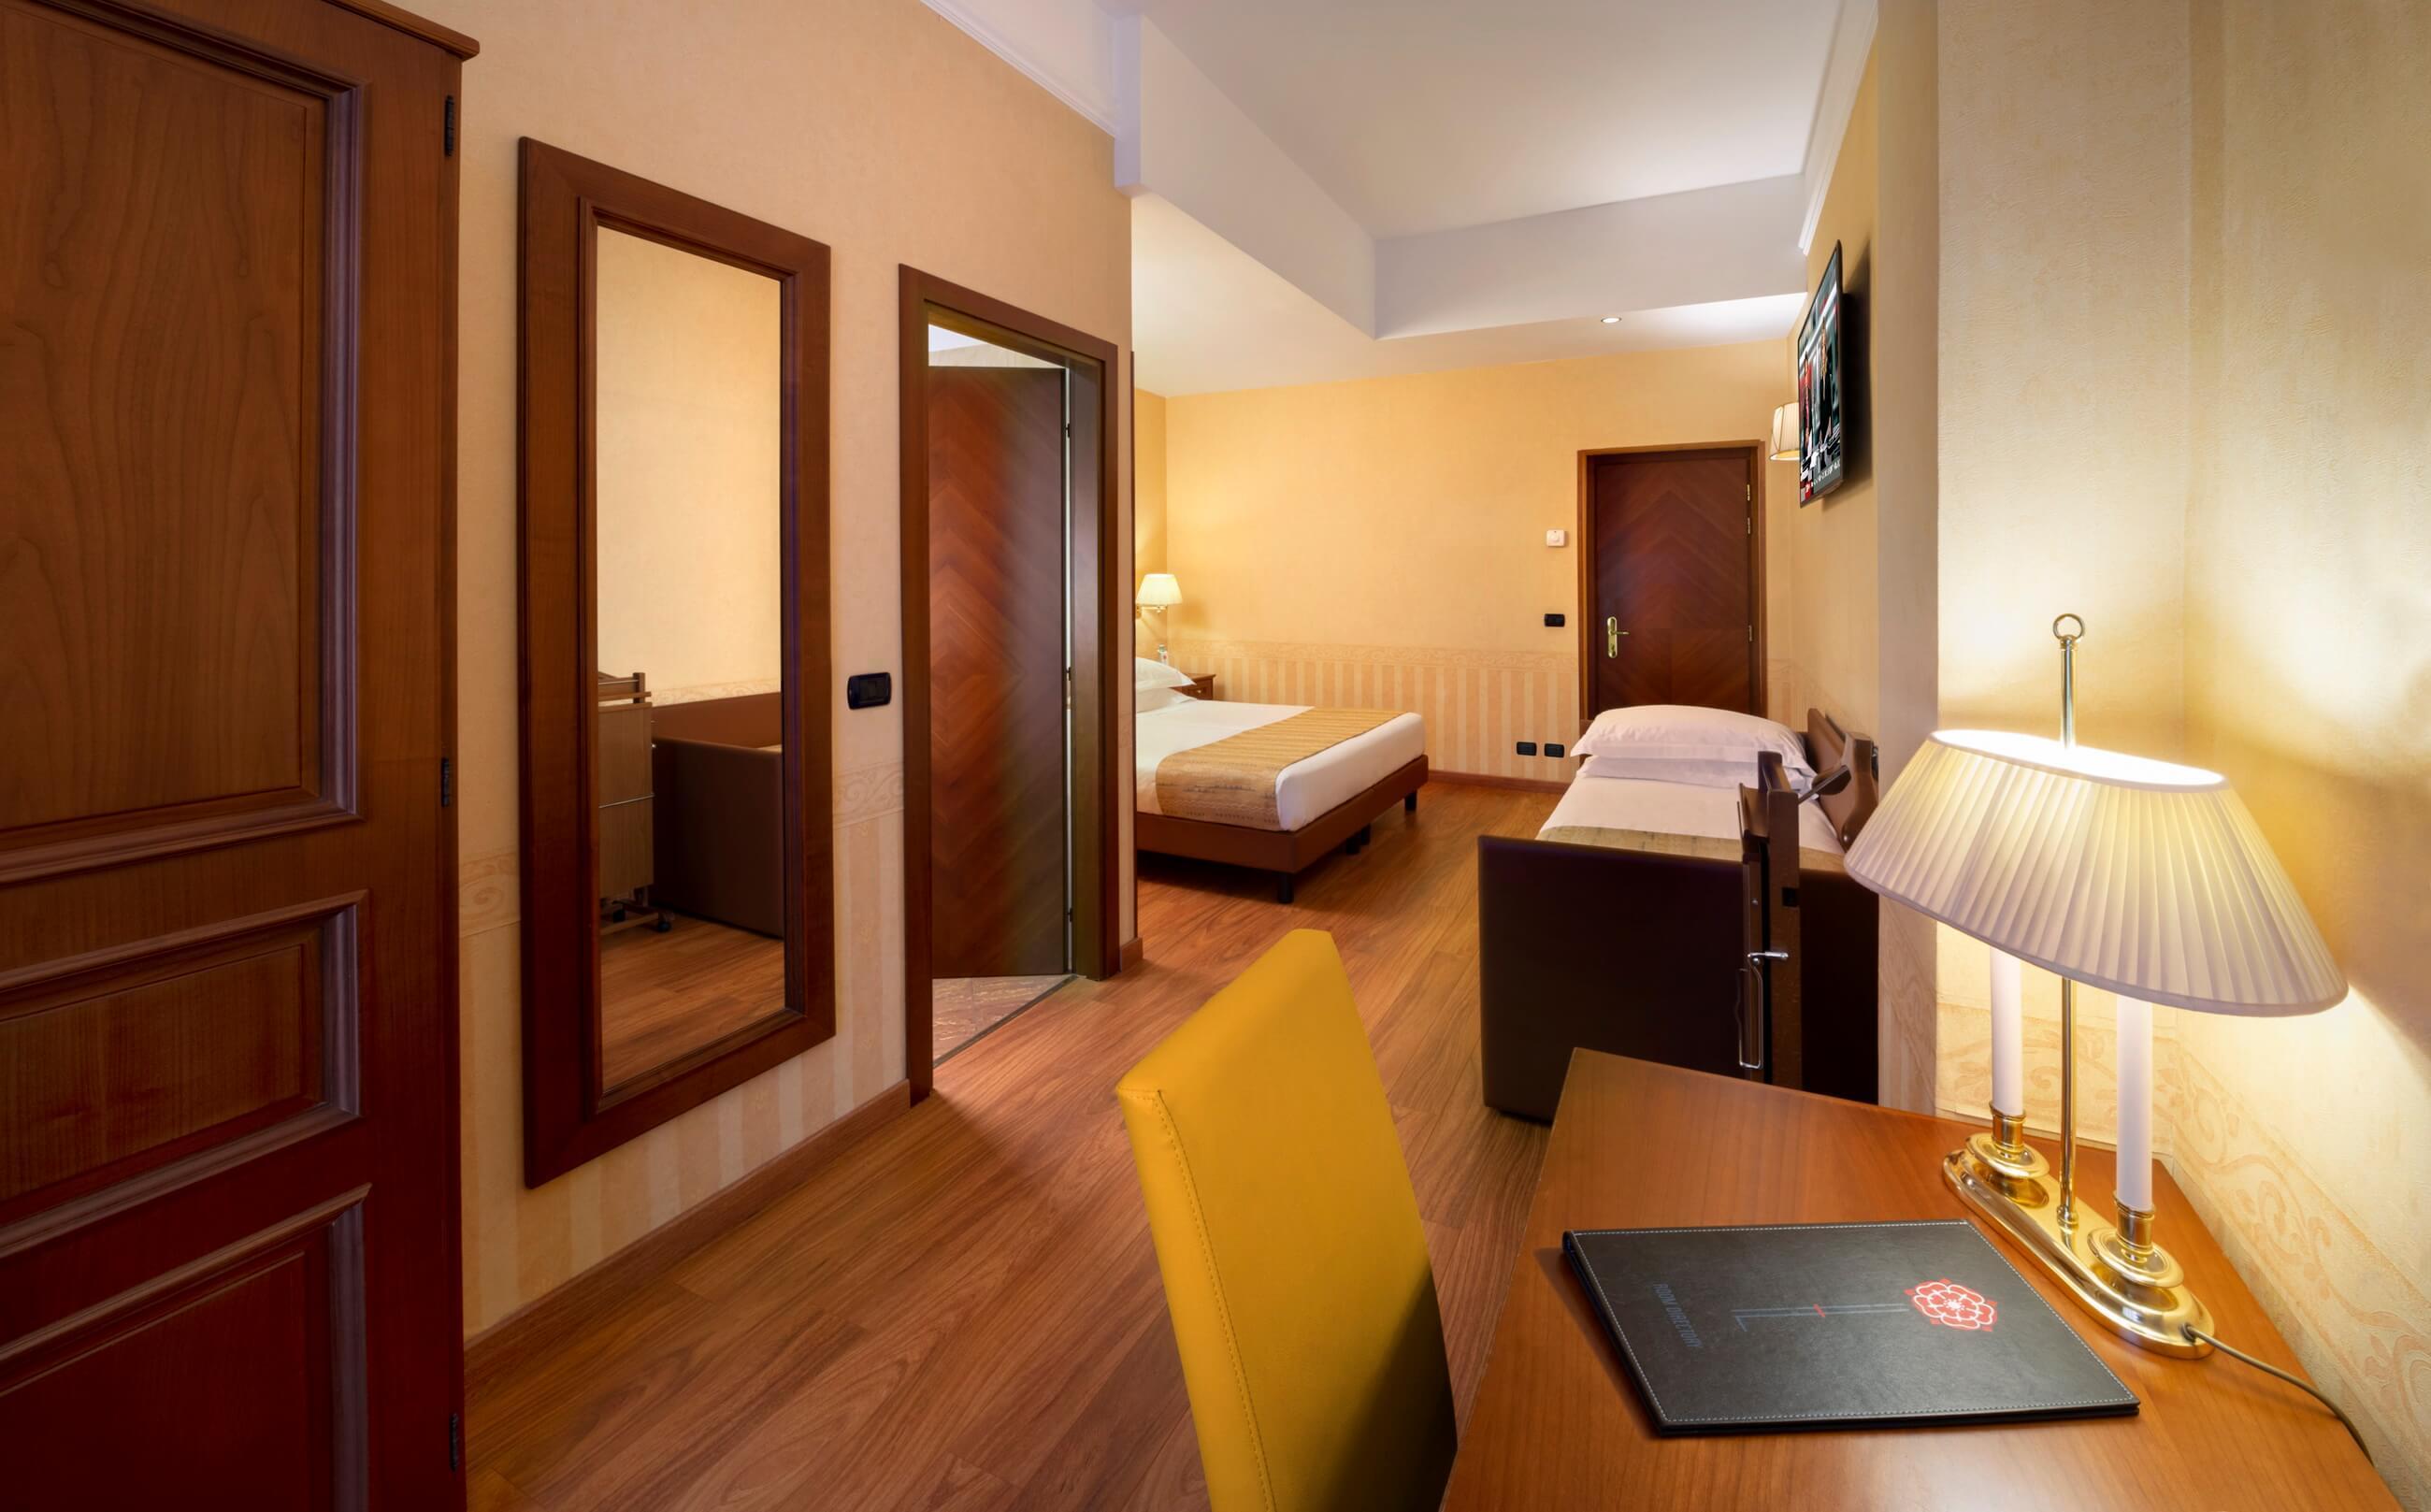 Camera Tripla, Hotel 3 Stelle a Milano | Lancaster Hotel